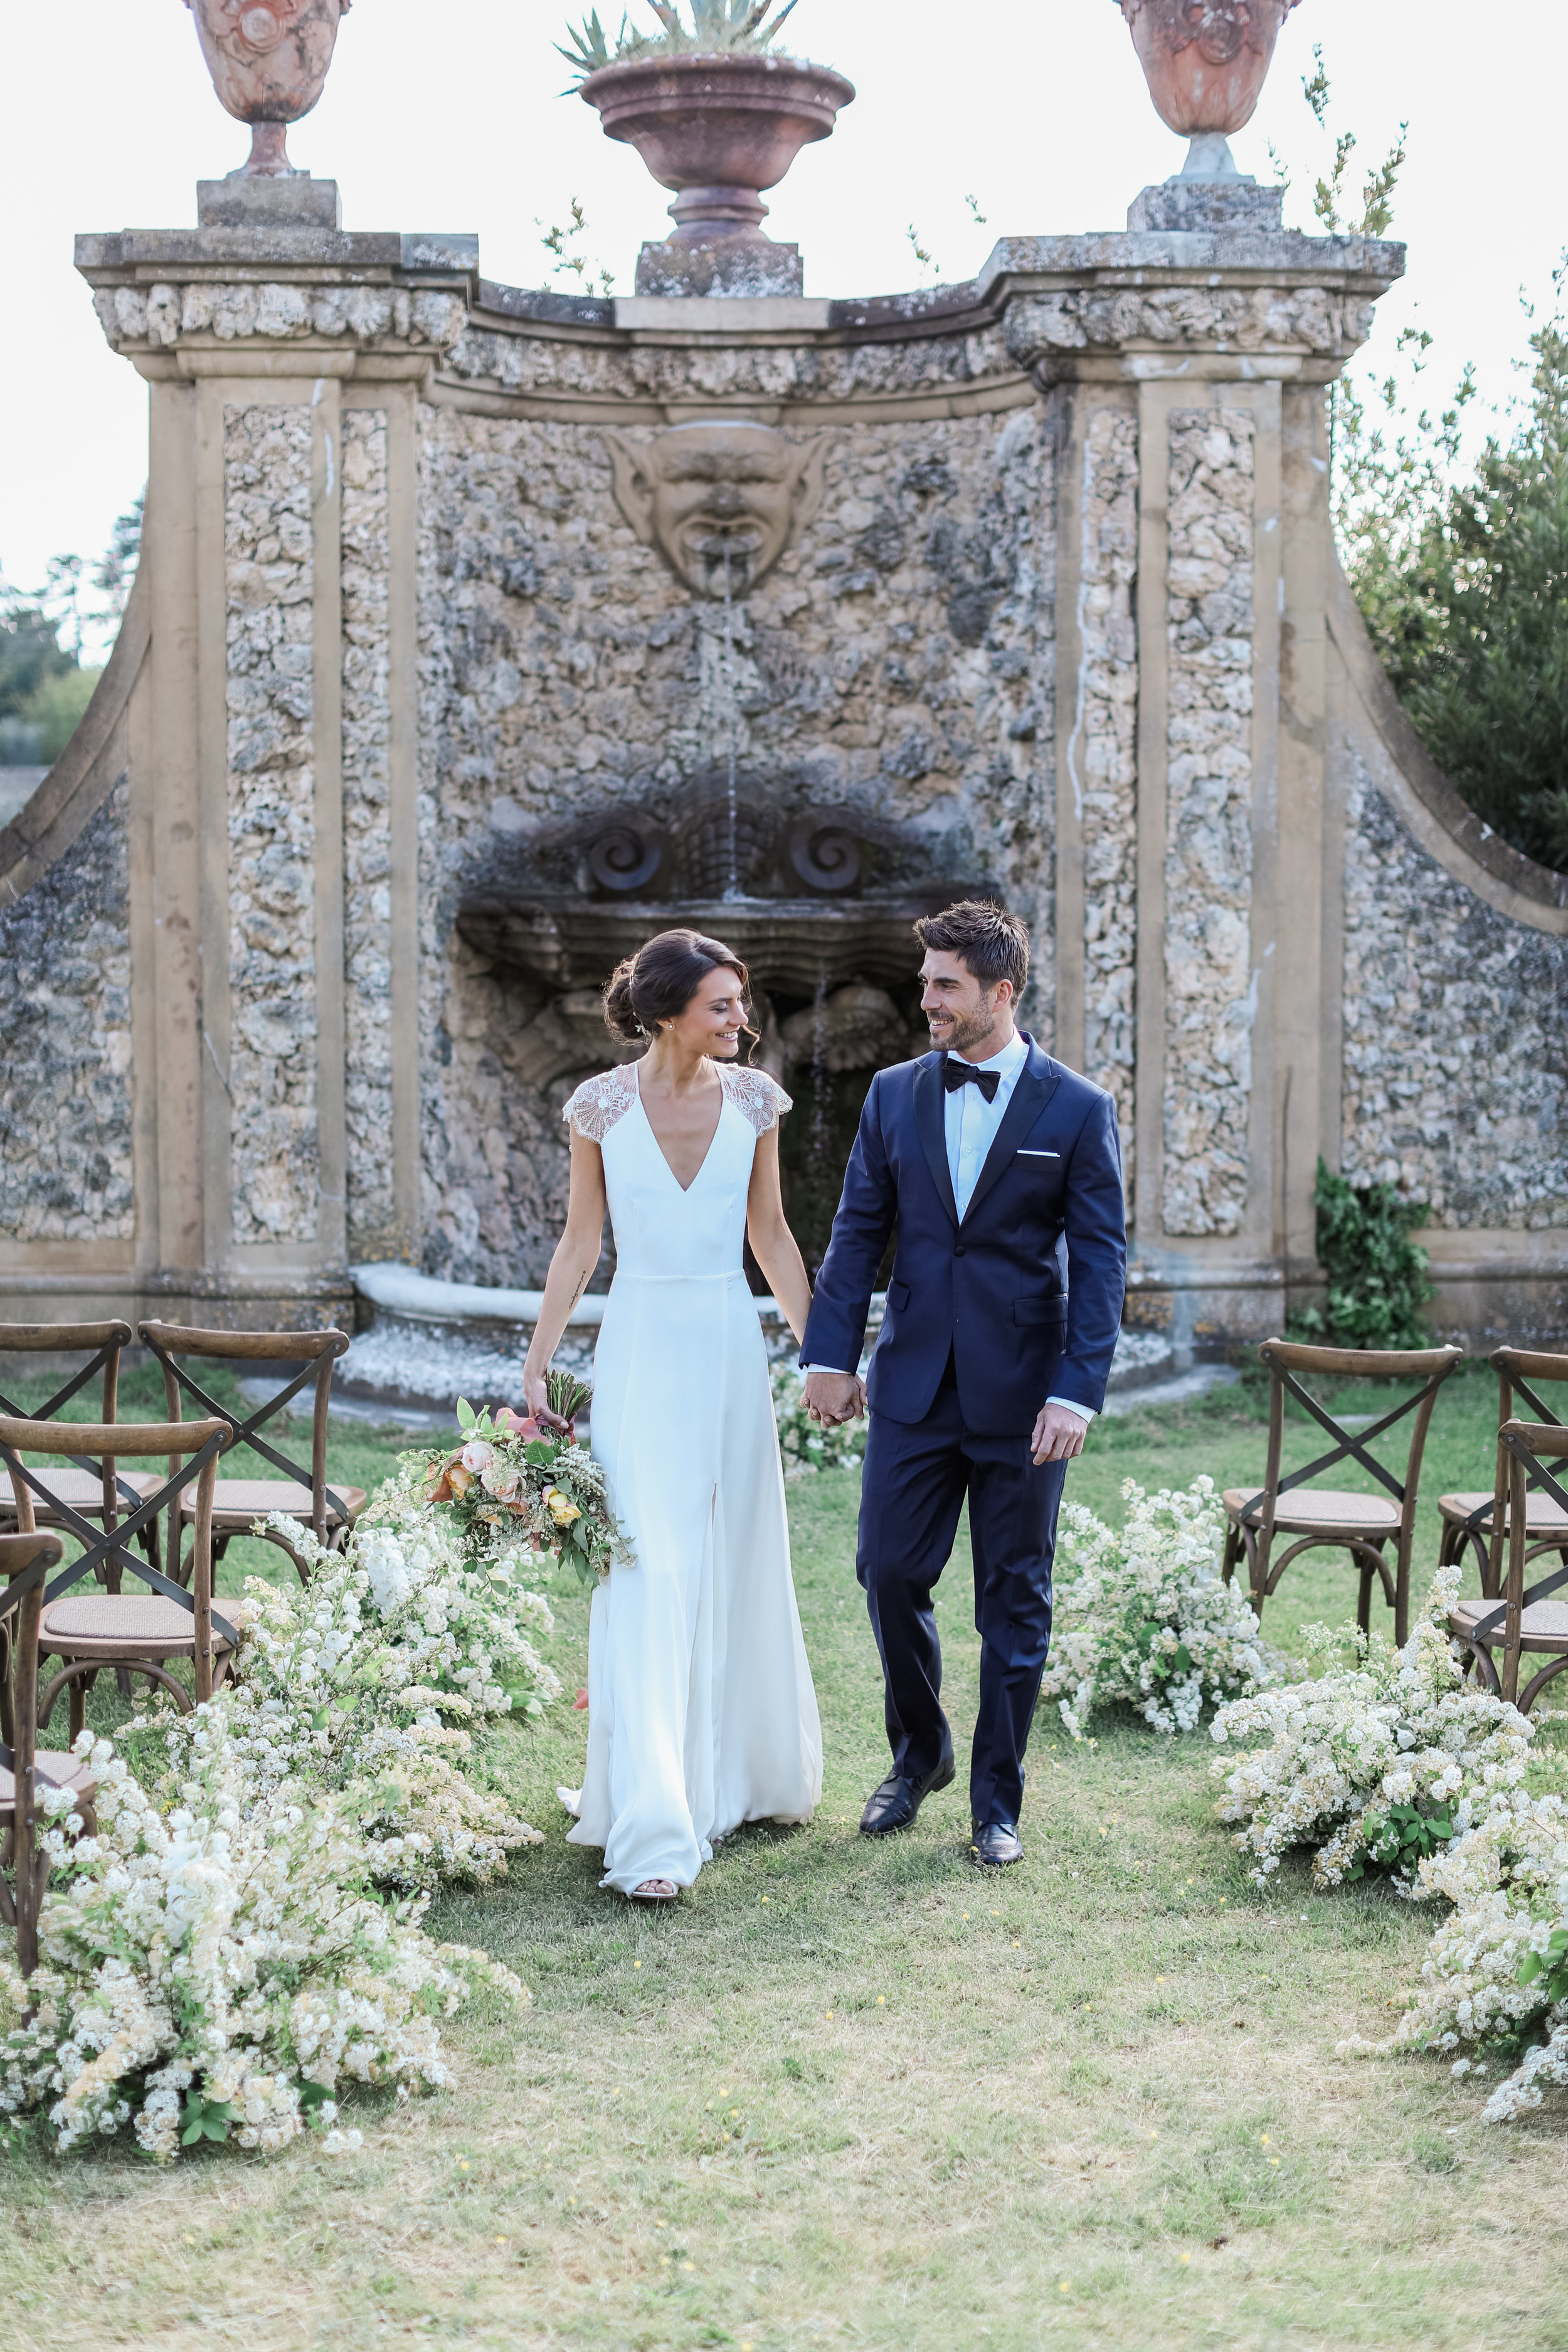 tuscany-wedding-photographer-52.jpg